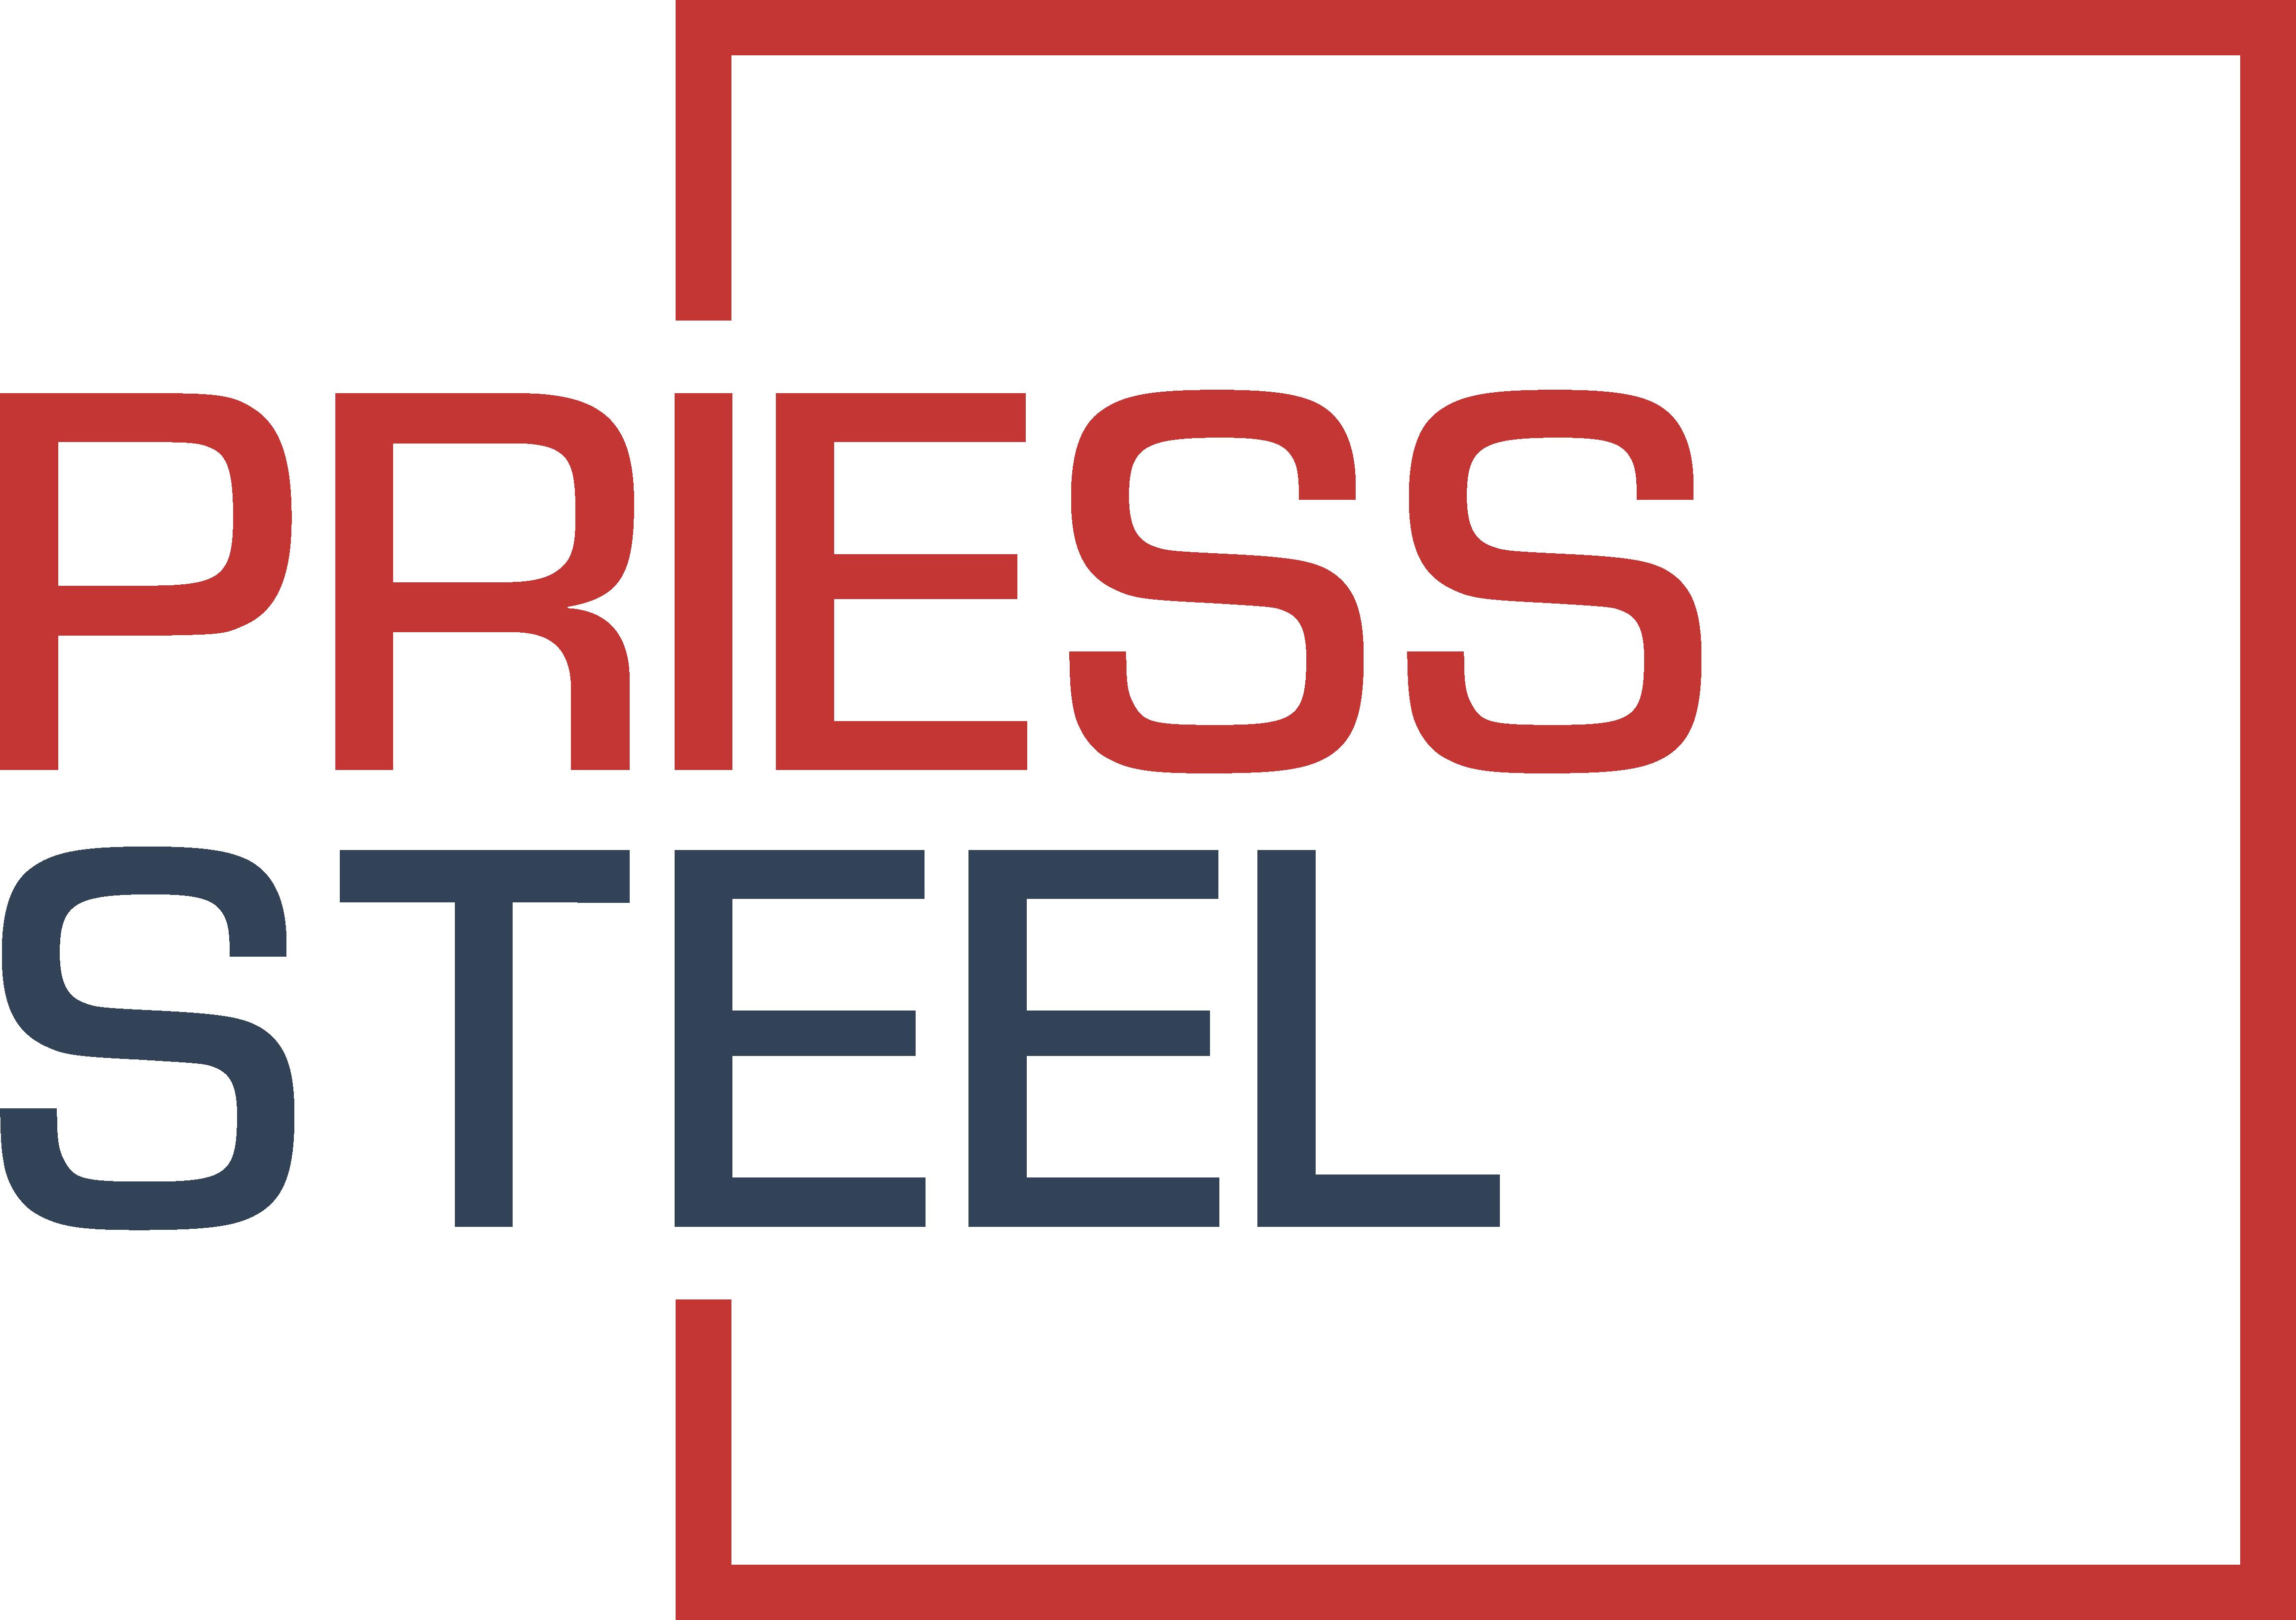 Priess Steel